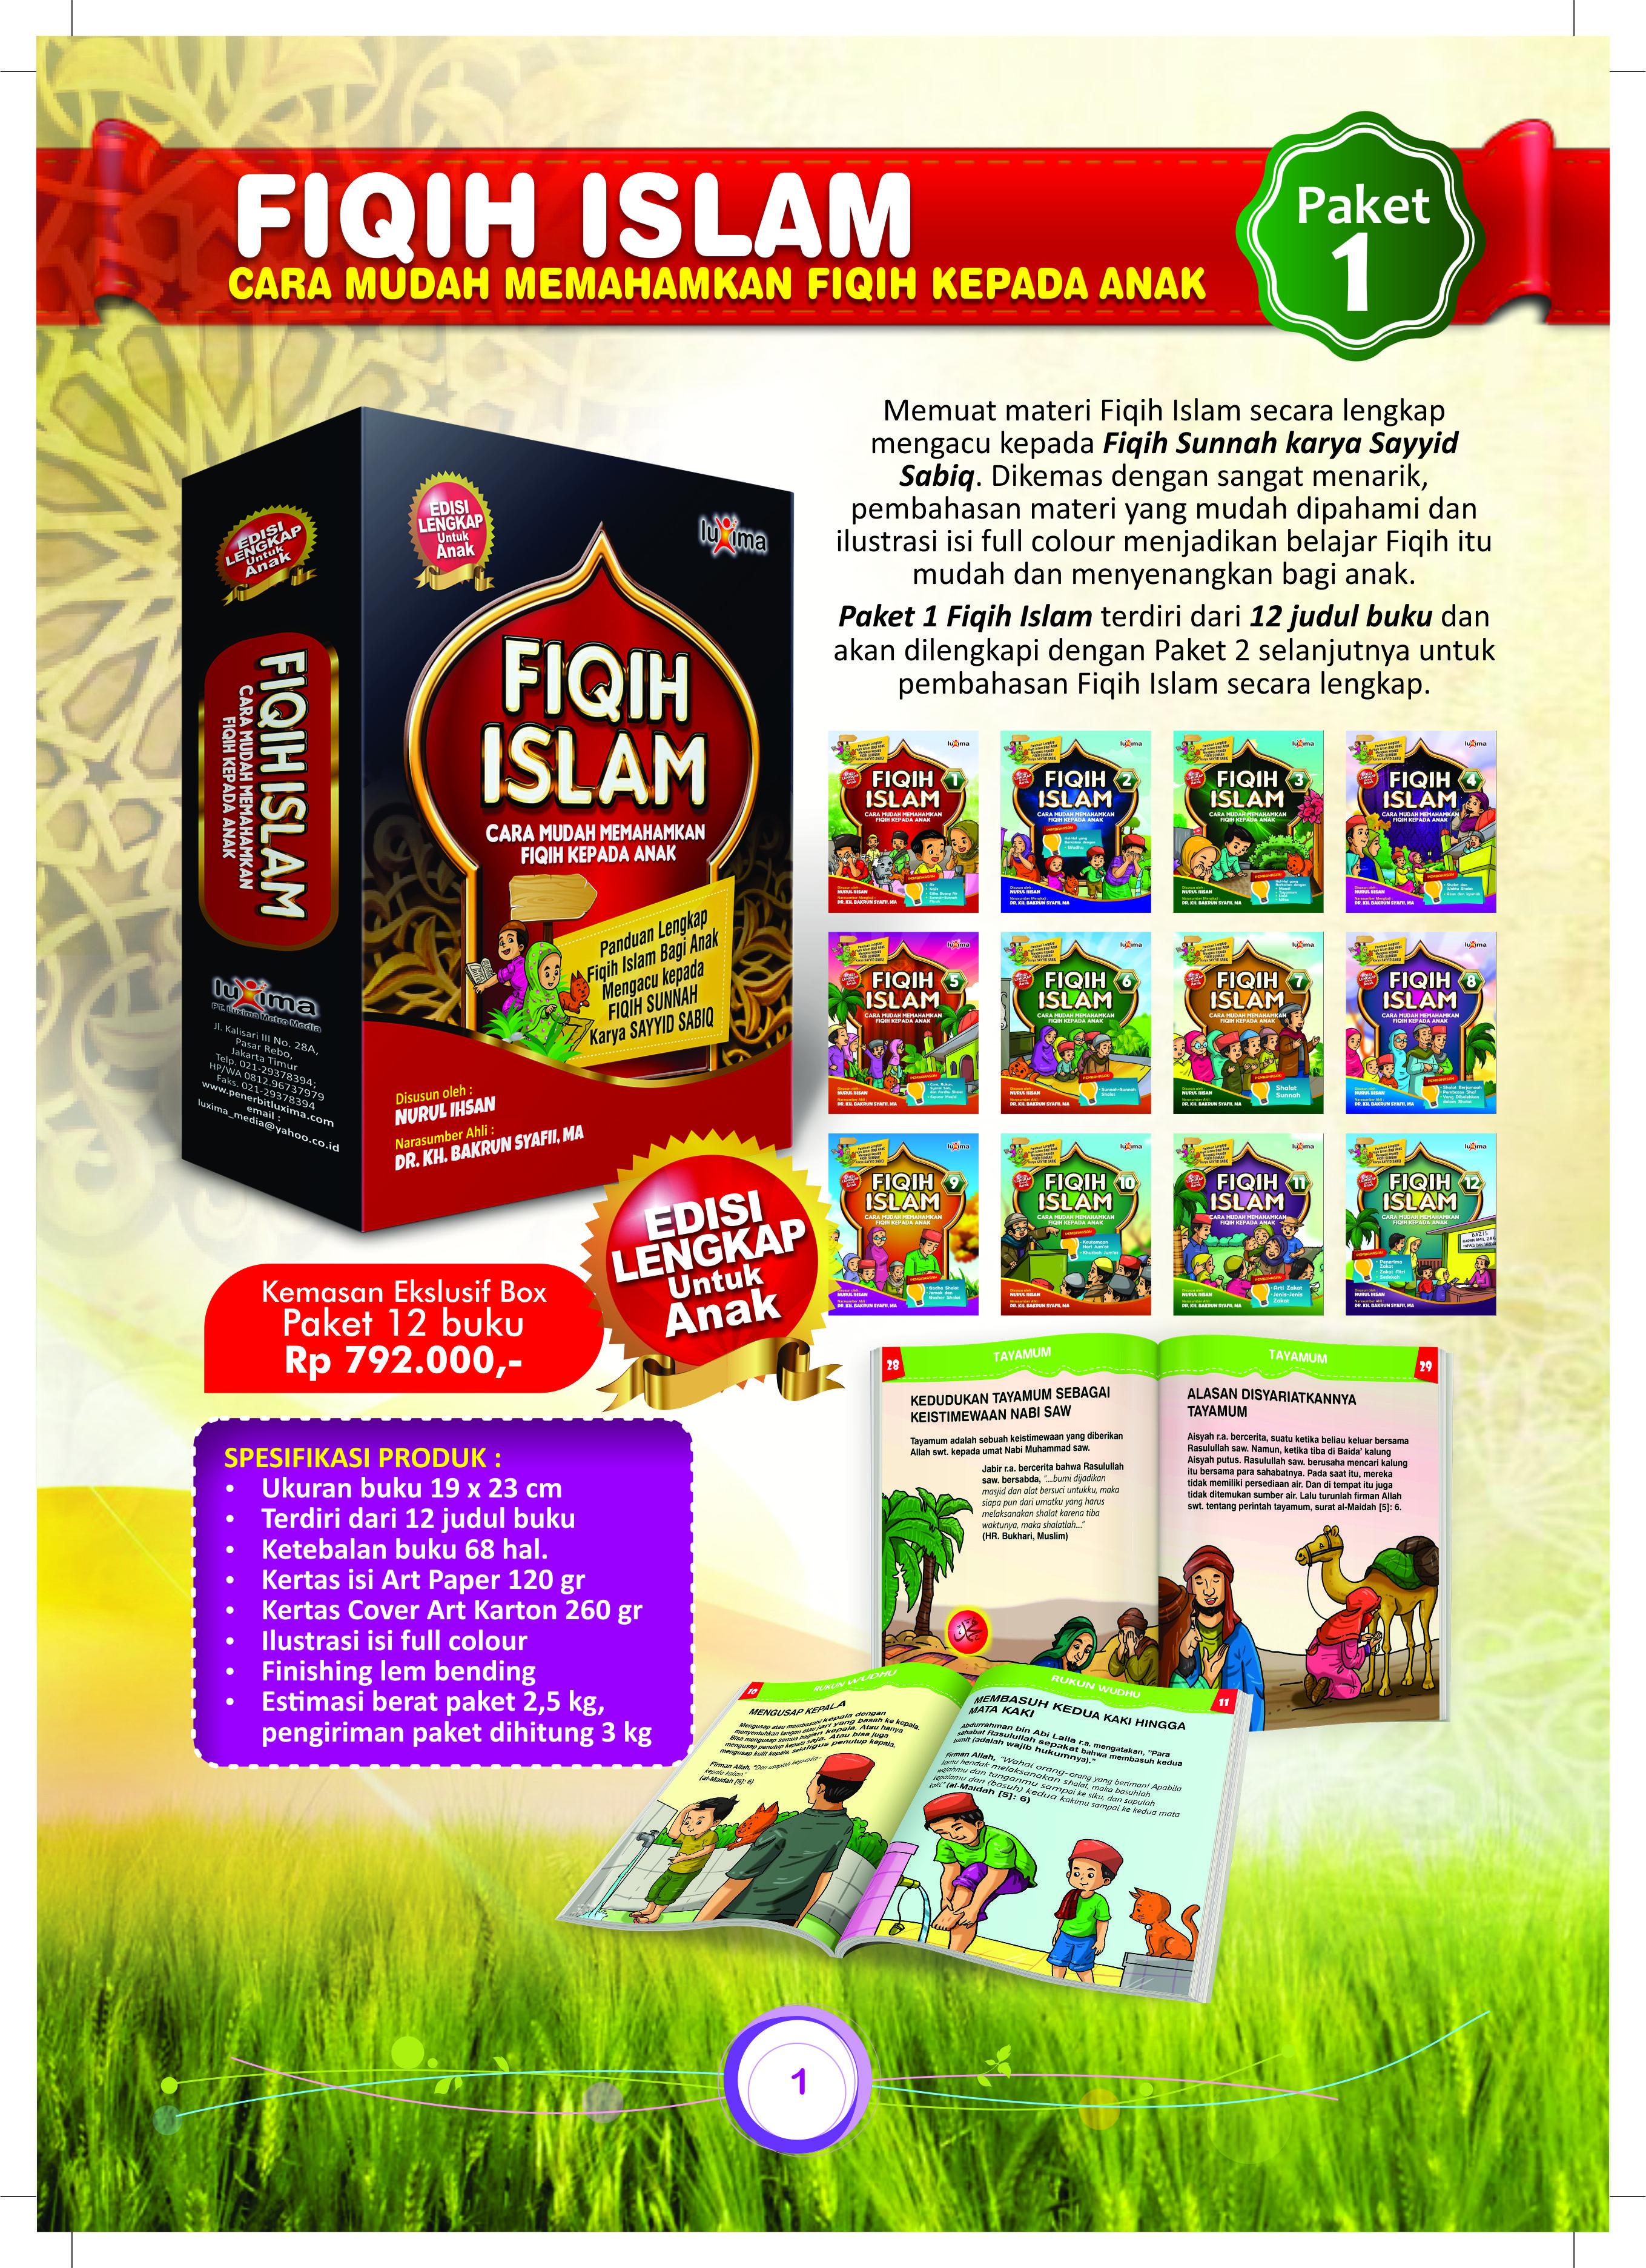 jual 12 judul paket fiqih islam bergambar